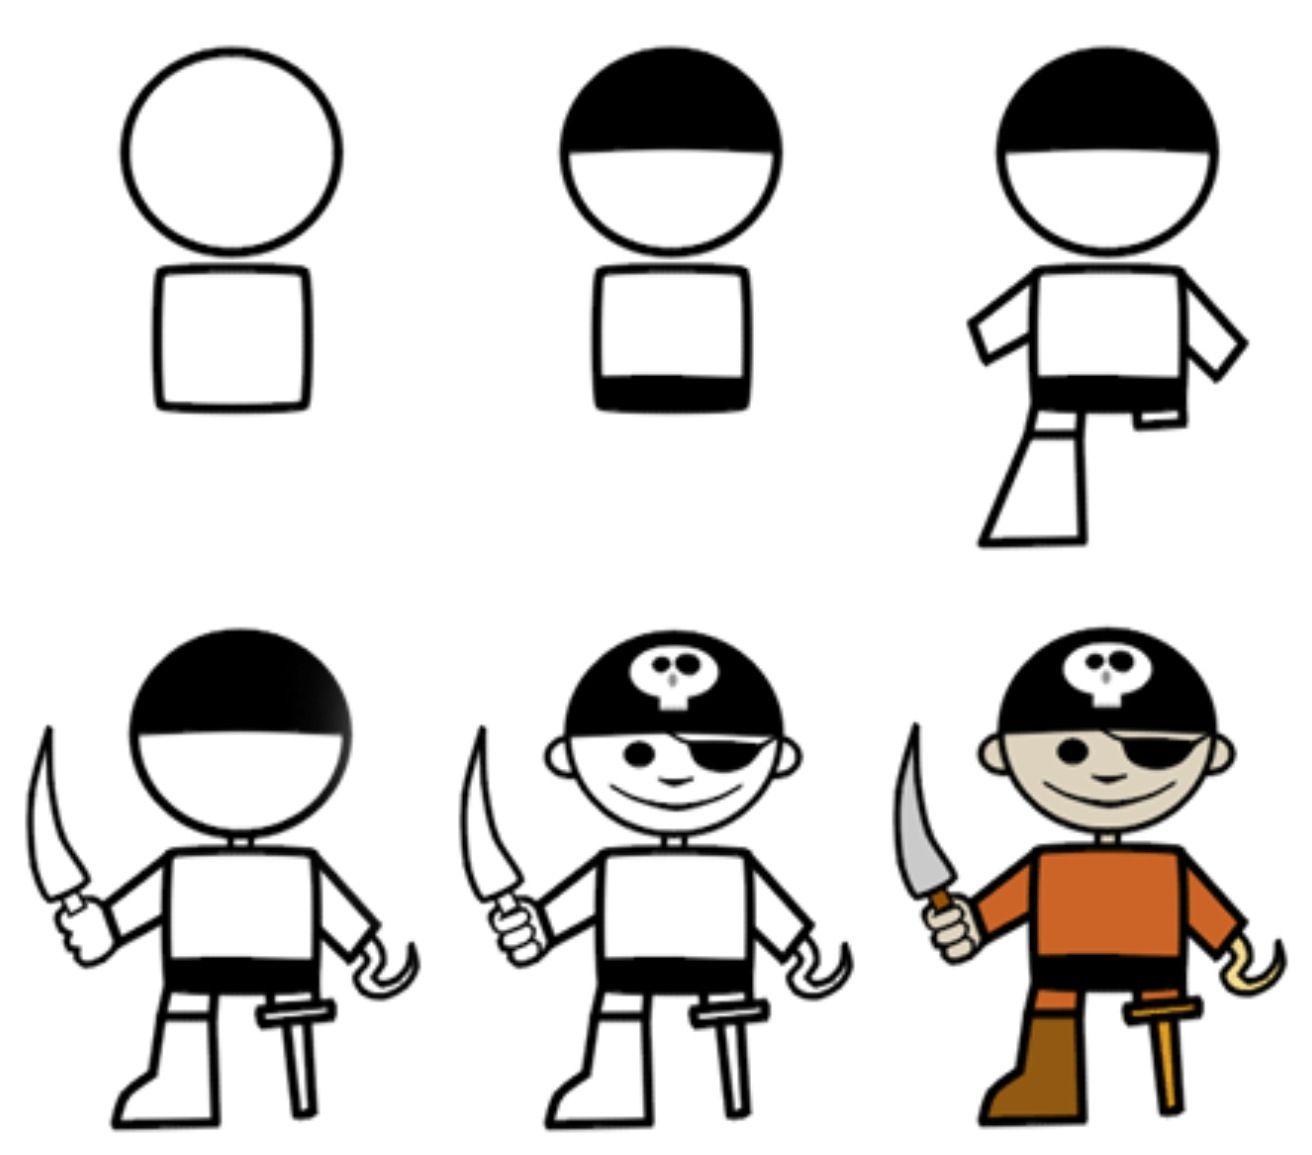 Pirates Cartoon Drawings Easy Drawings Easy Cartoon Drawings